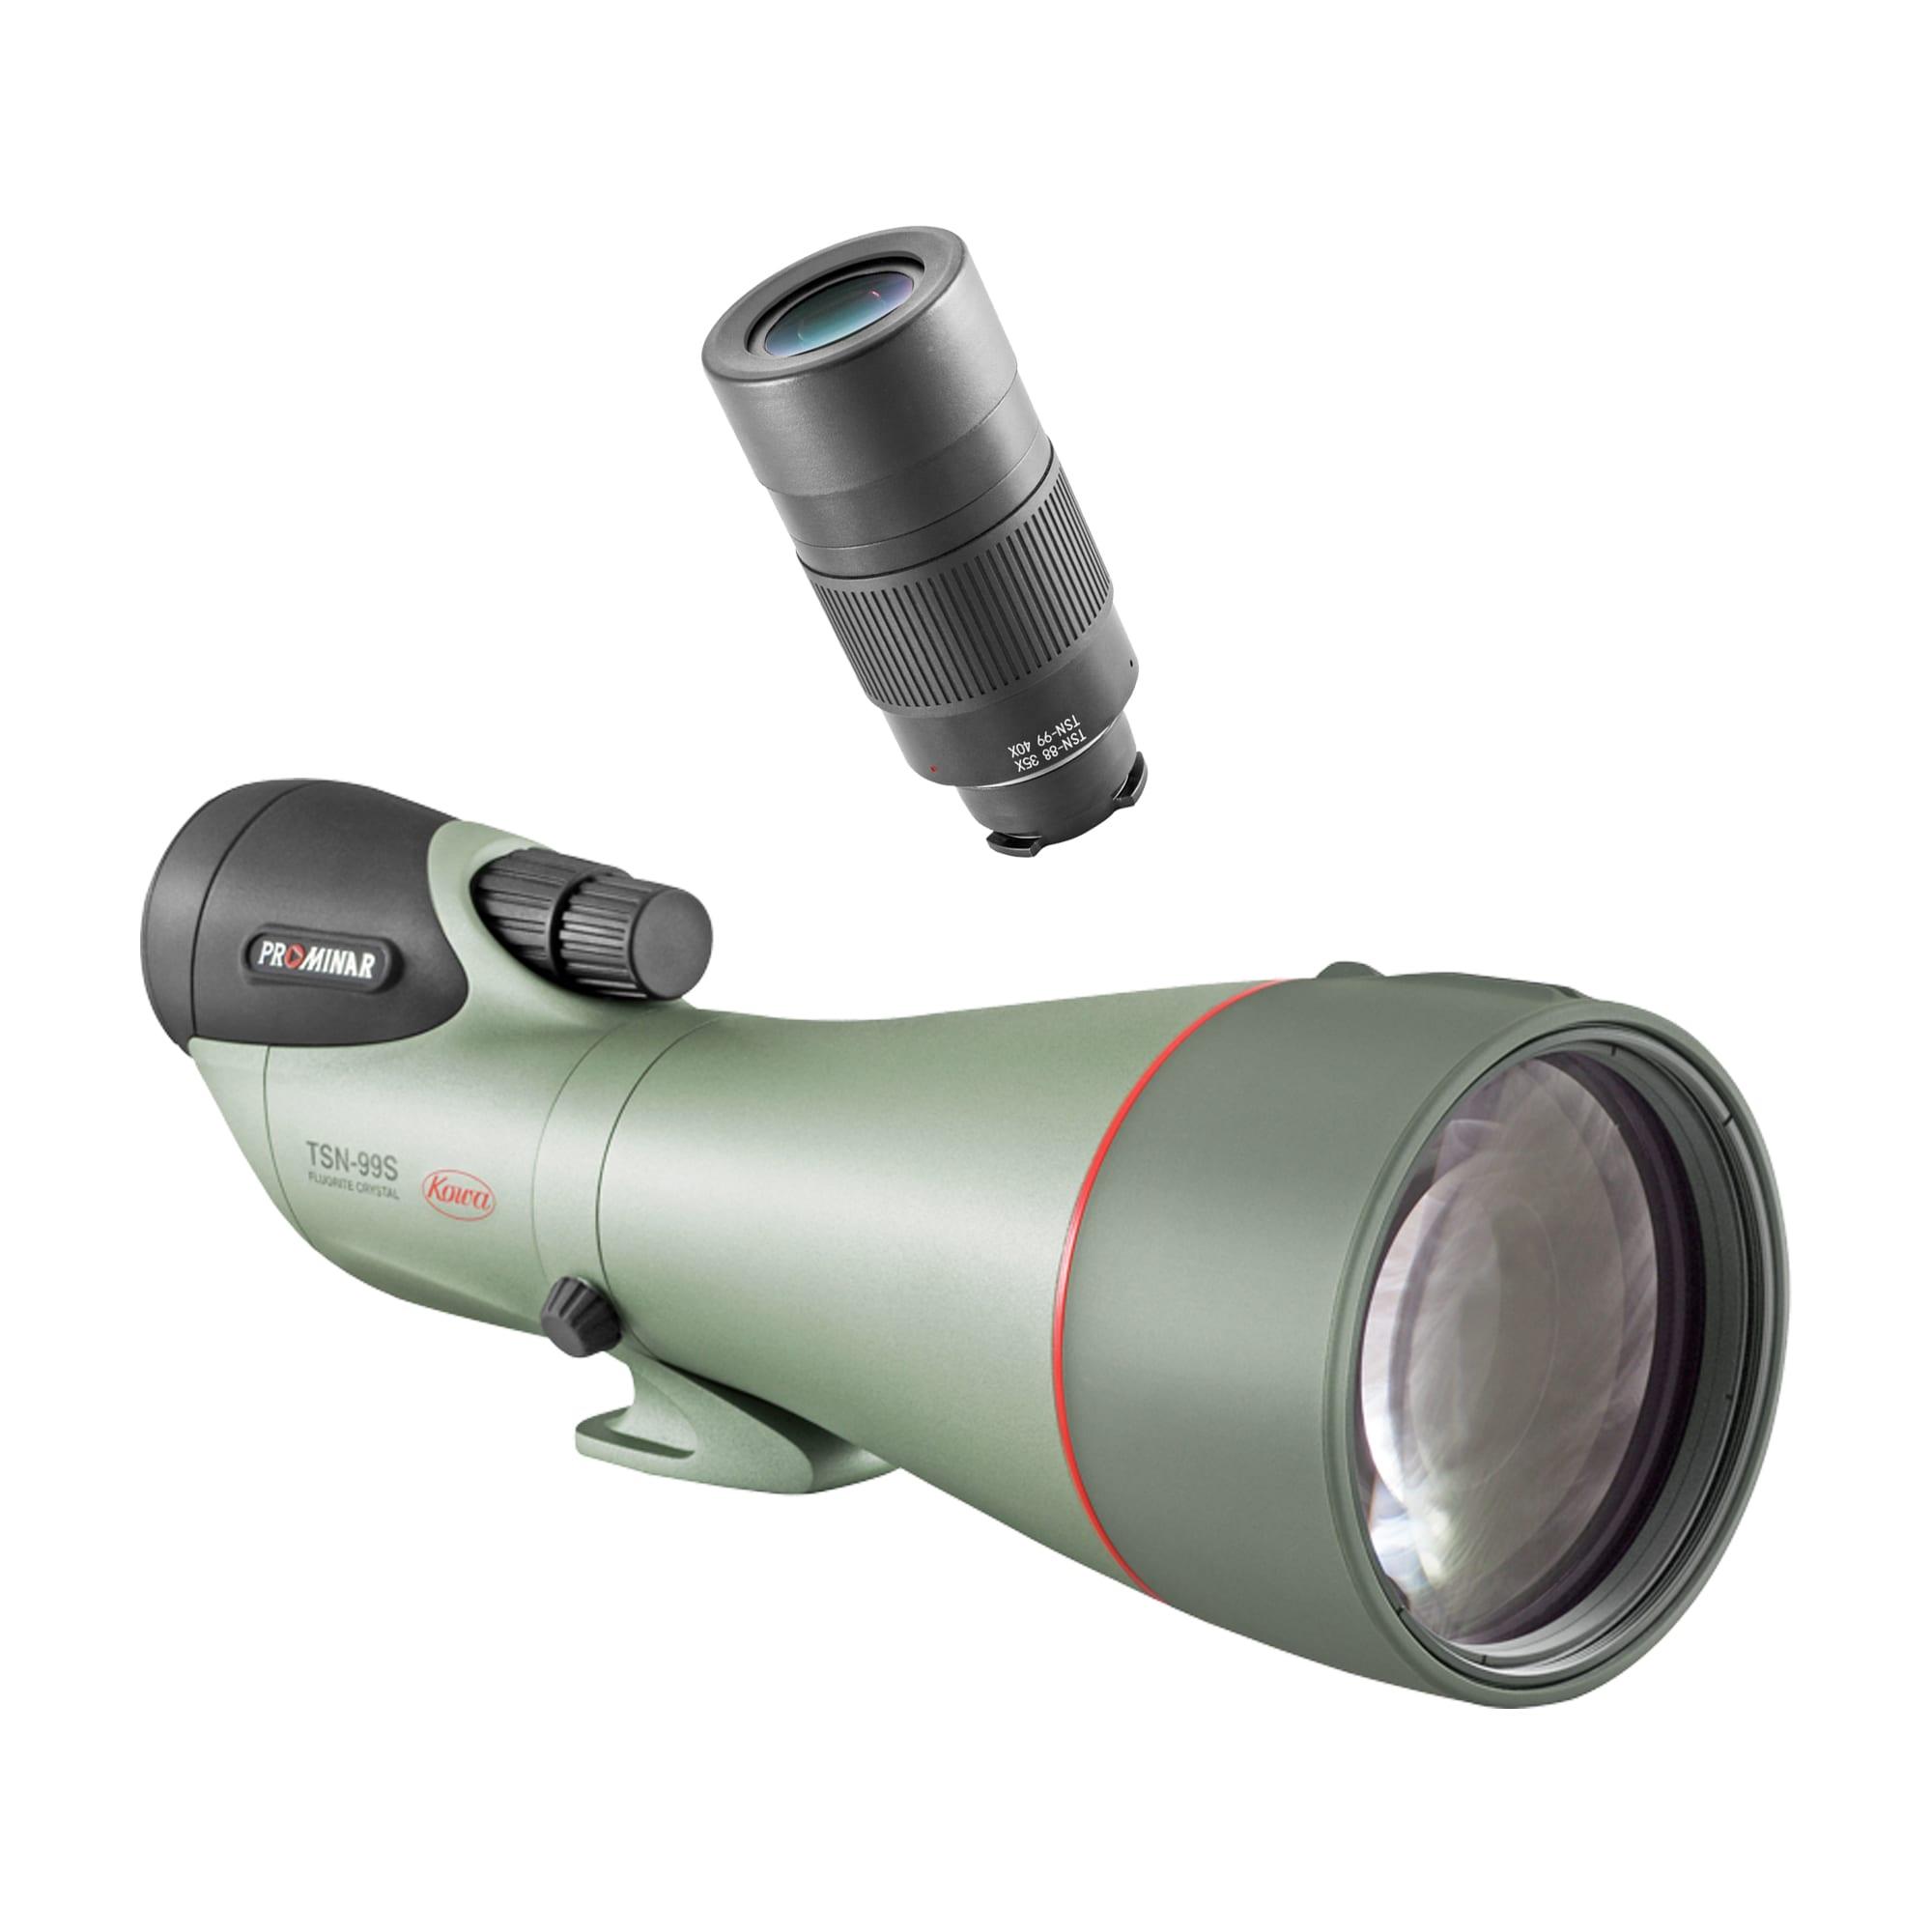 Kowa Spottingscope TSN-99S PROMINAR + 40x Extreme Wide